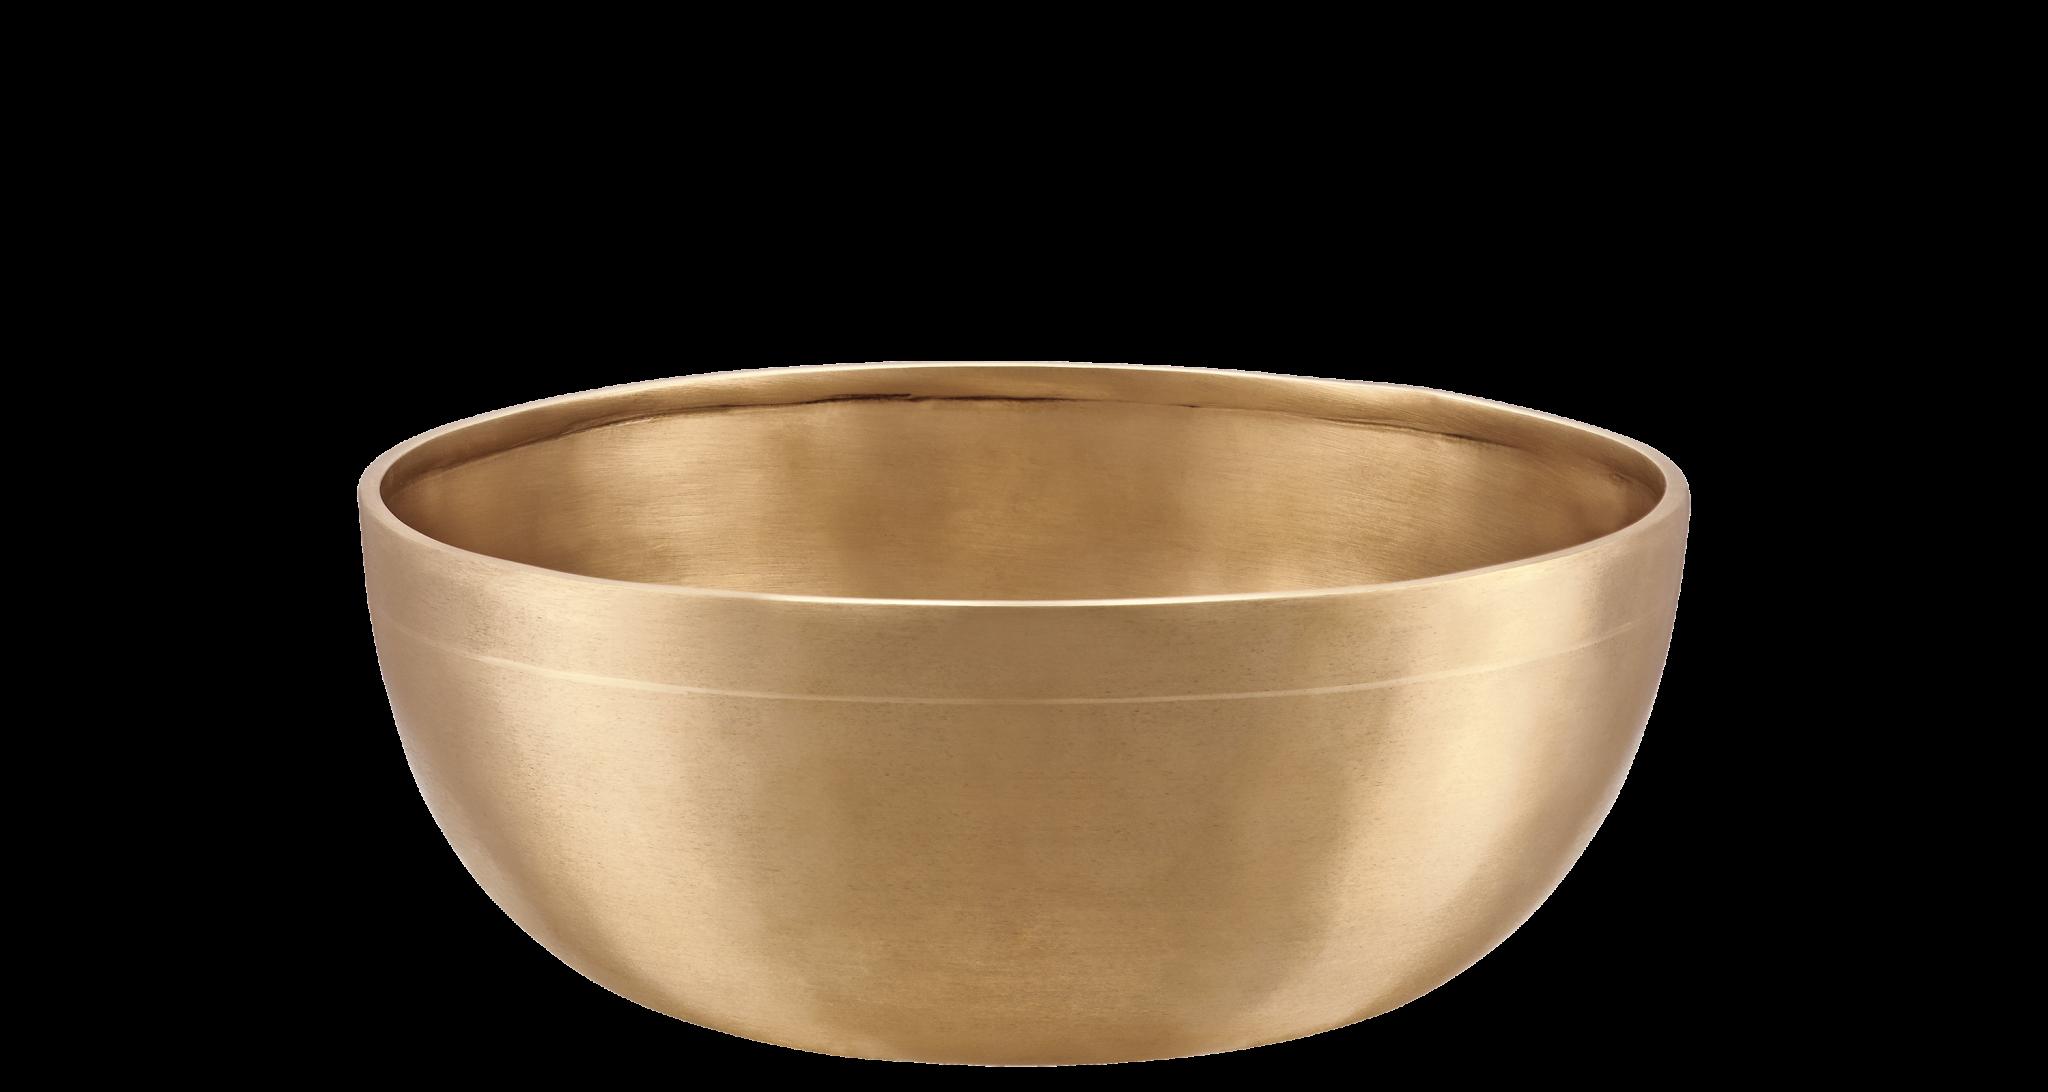 Meinl Meinl Energy TherapySinging Bowl 7.8in